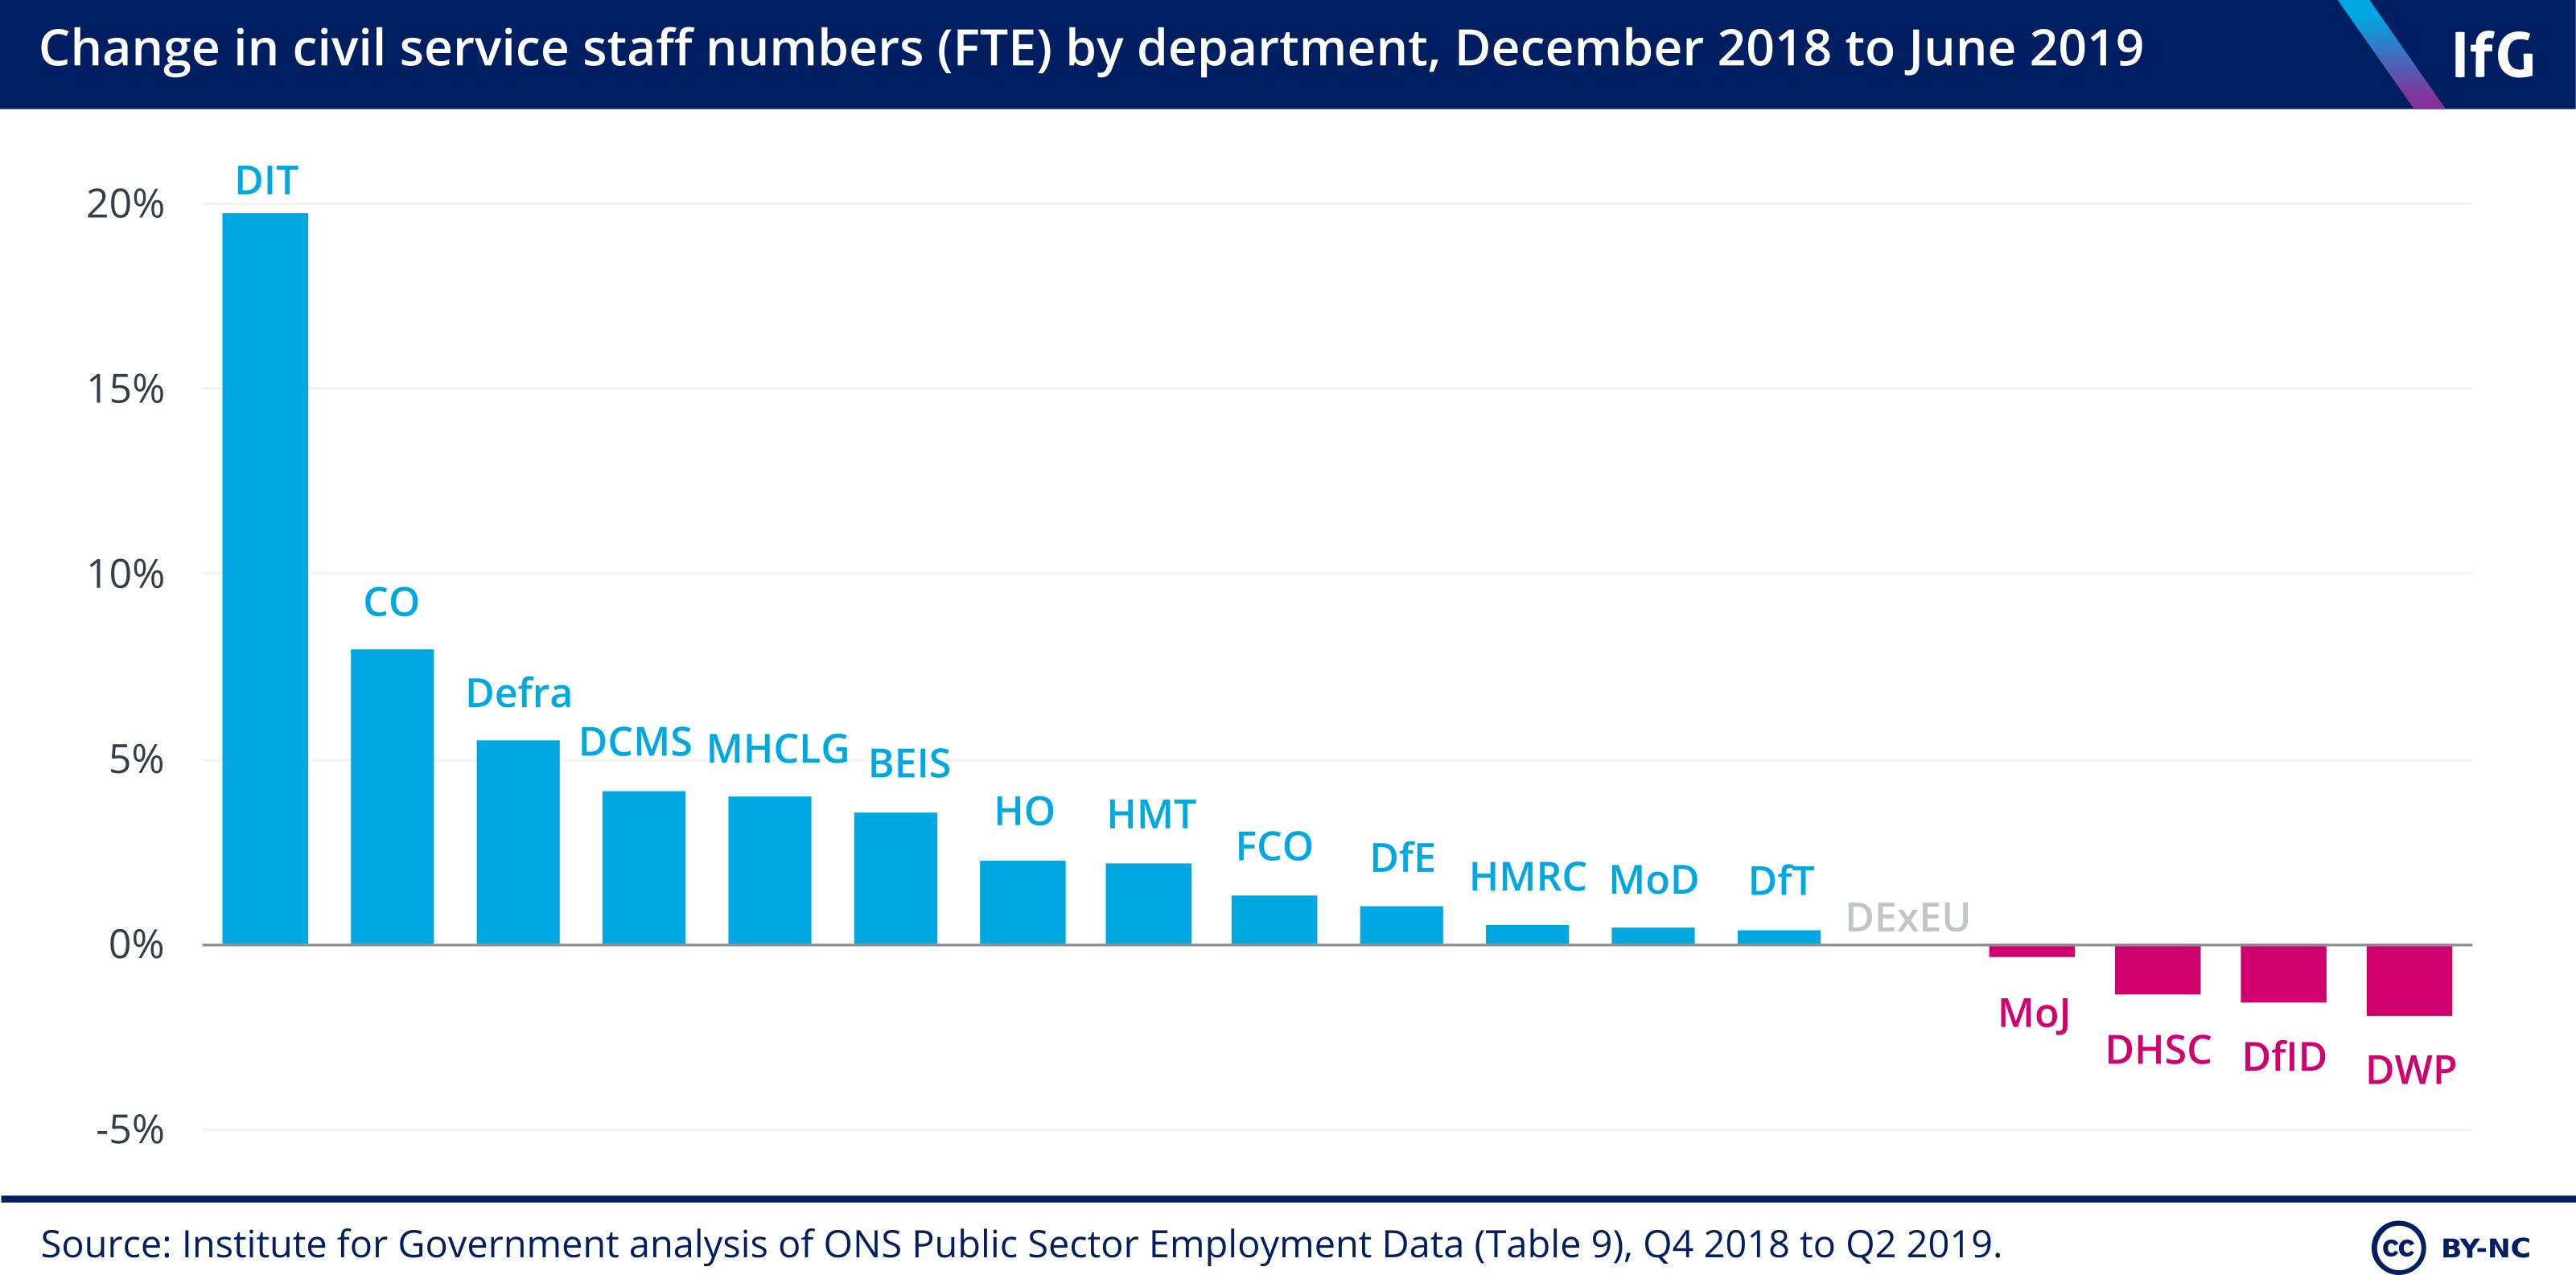 Departmental change Q1 2019 to Q2 2019